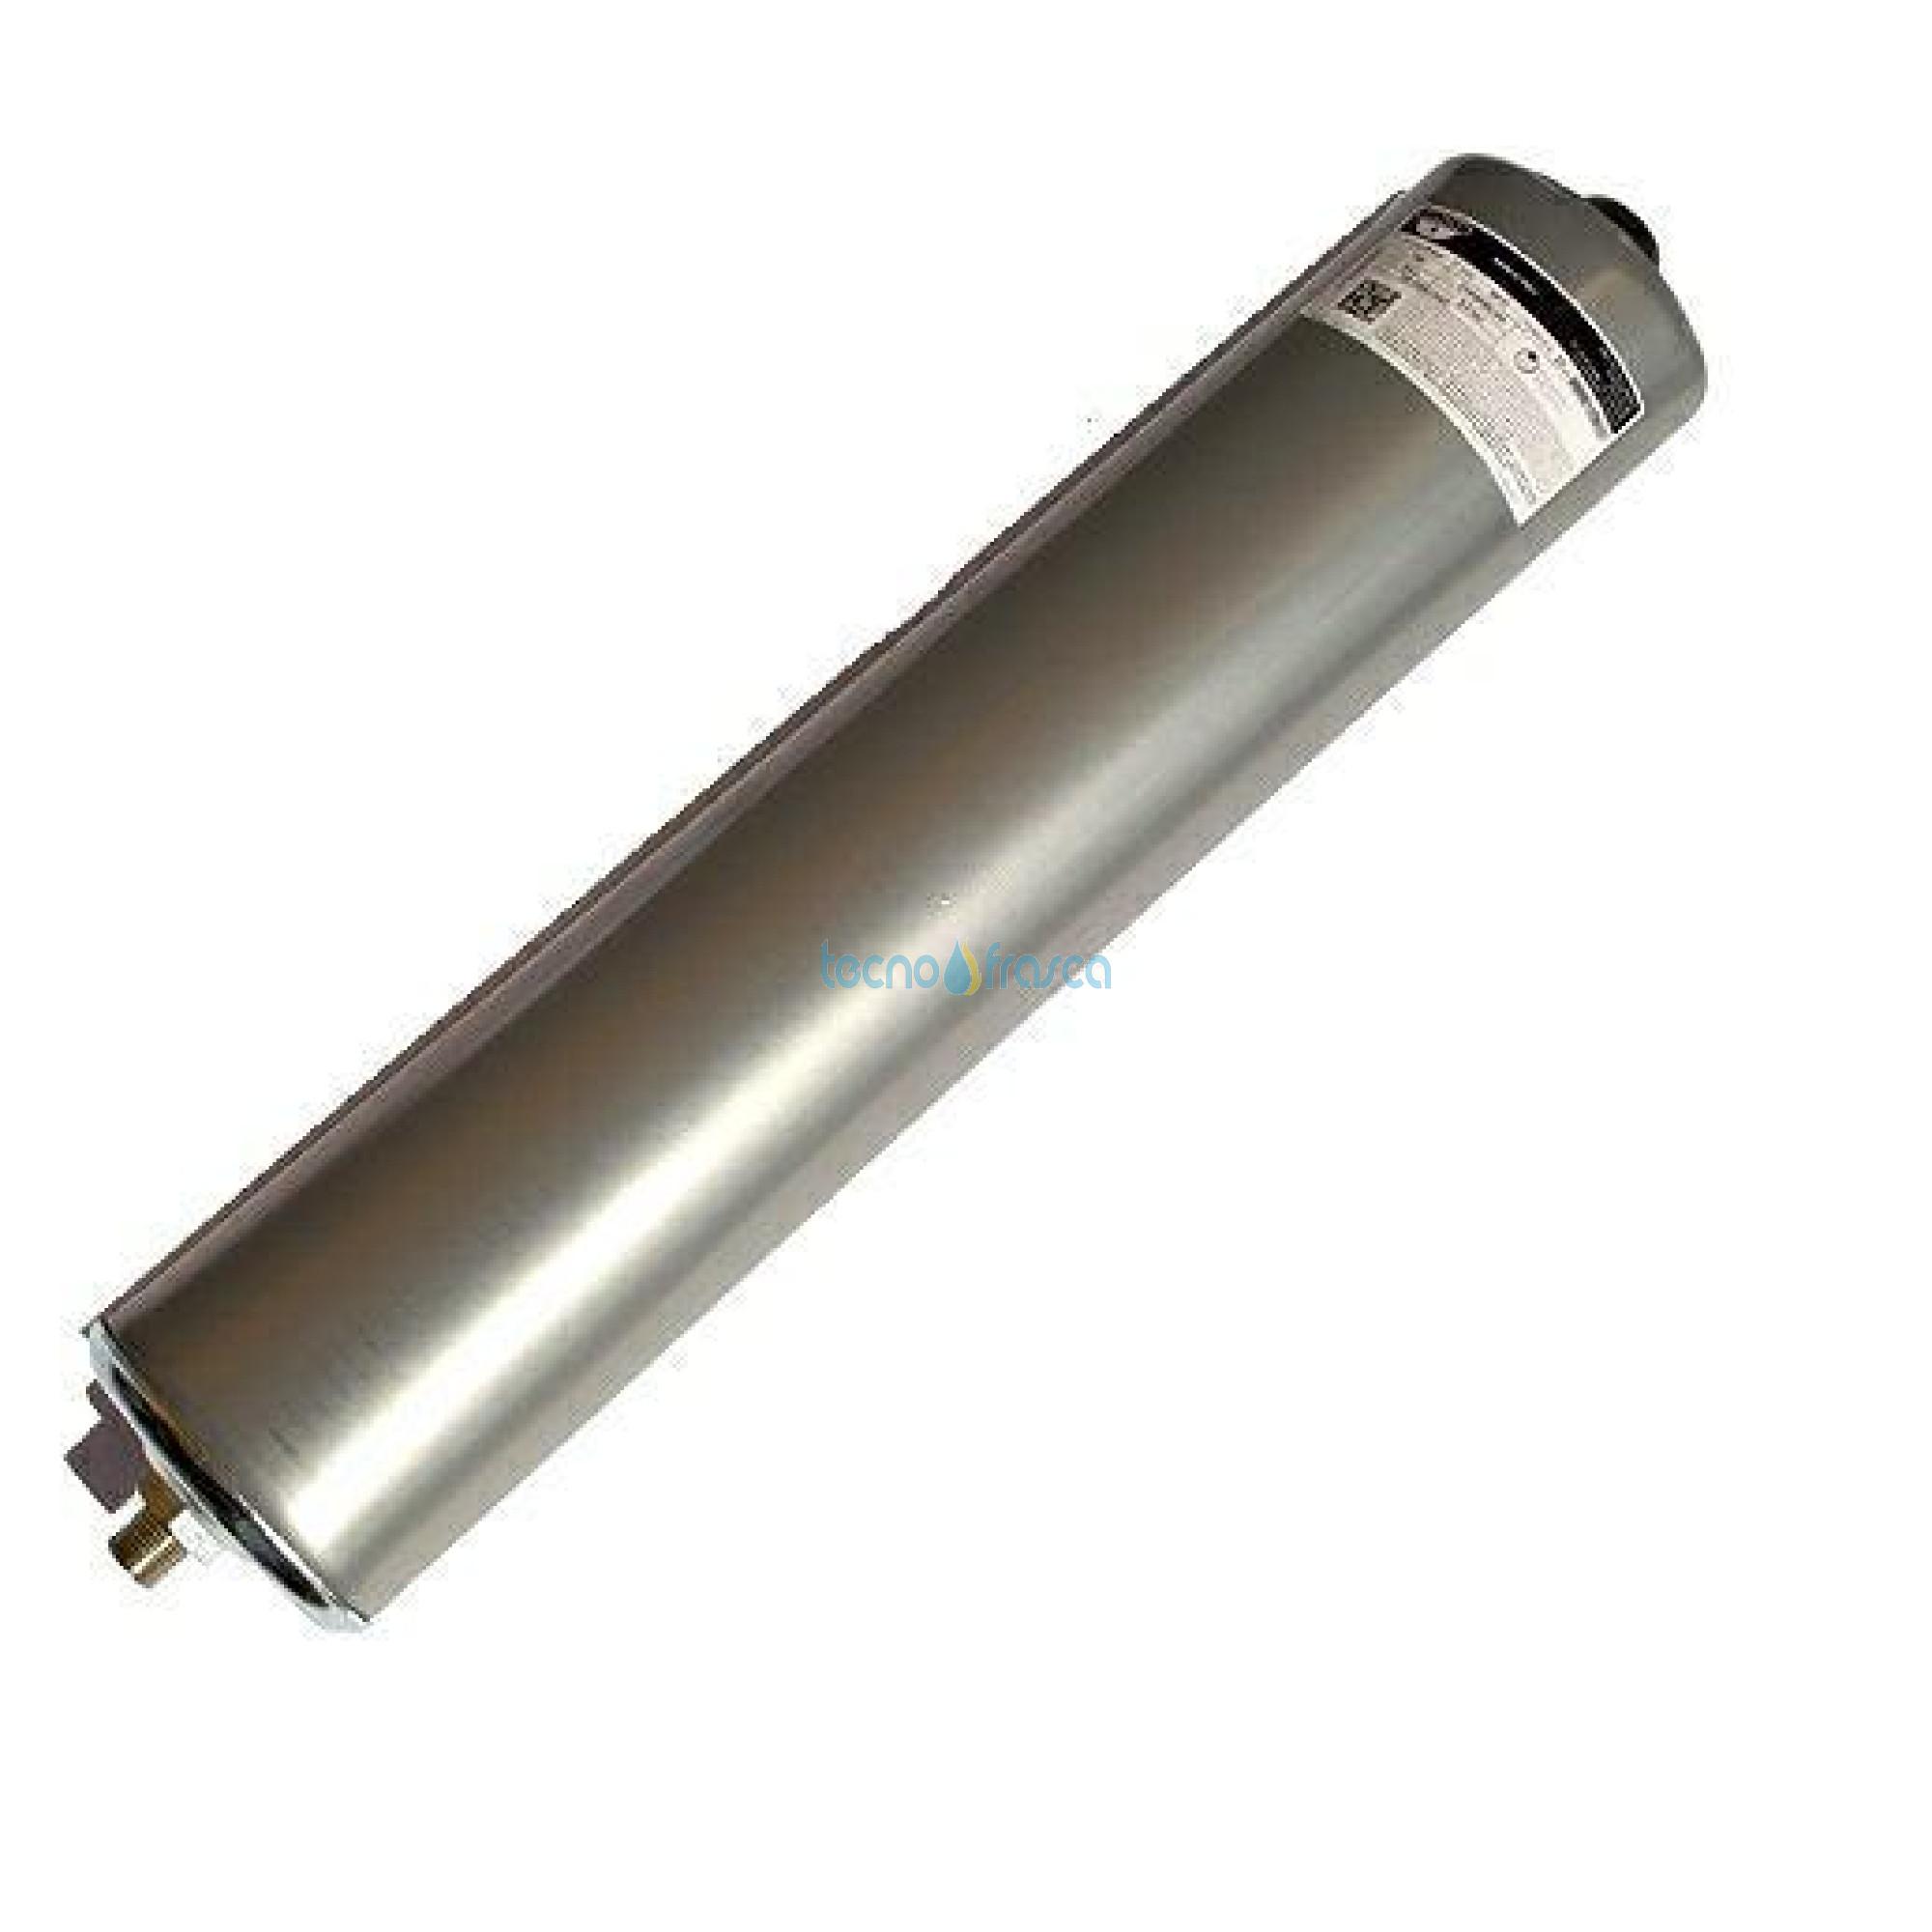 Hermann vaso di espansione lt4 tubolare h160564004